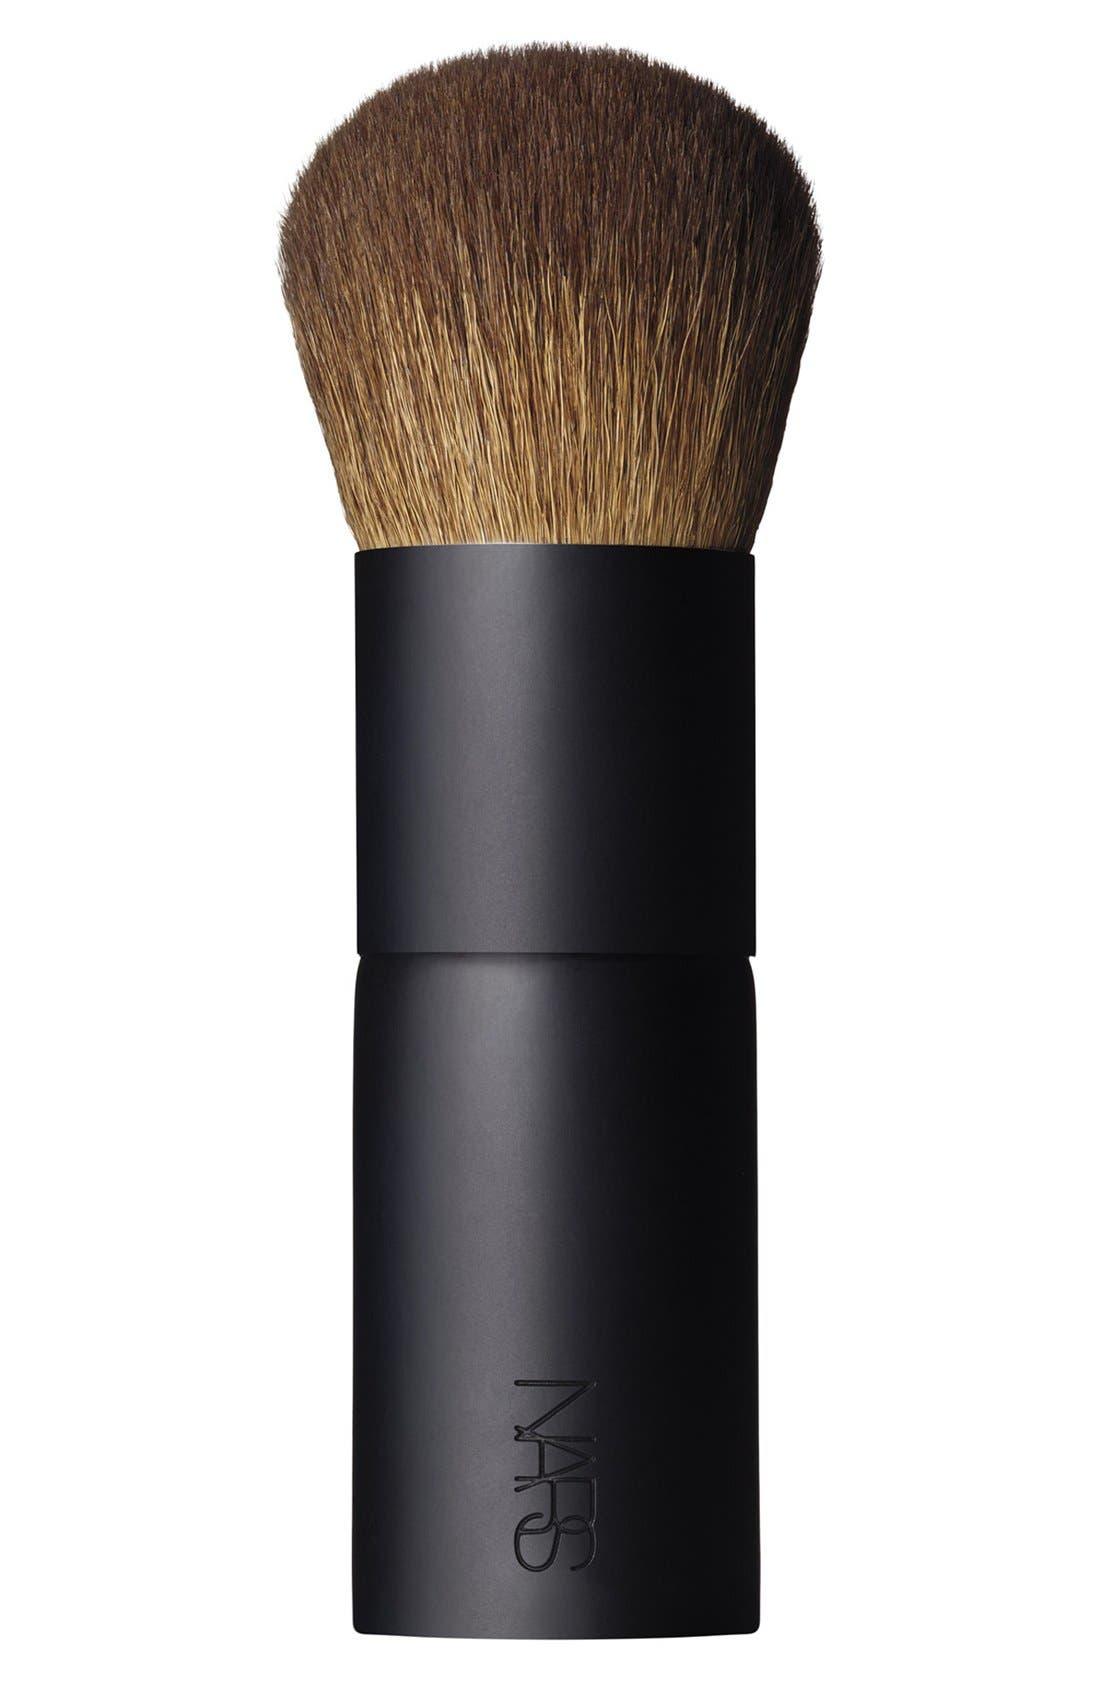 #11 Bronzing Powder Brush,                             Main thumbnail 1, color,                             000